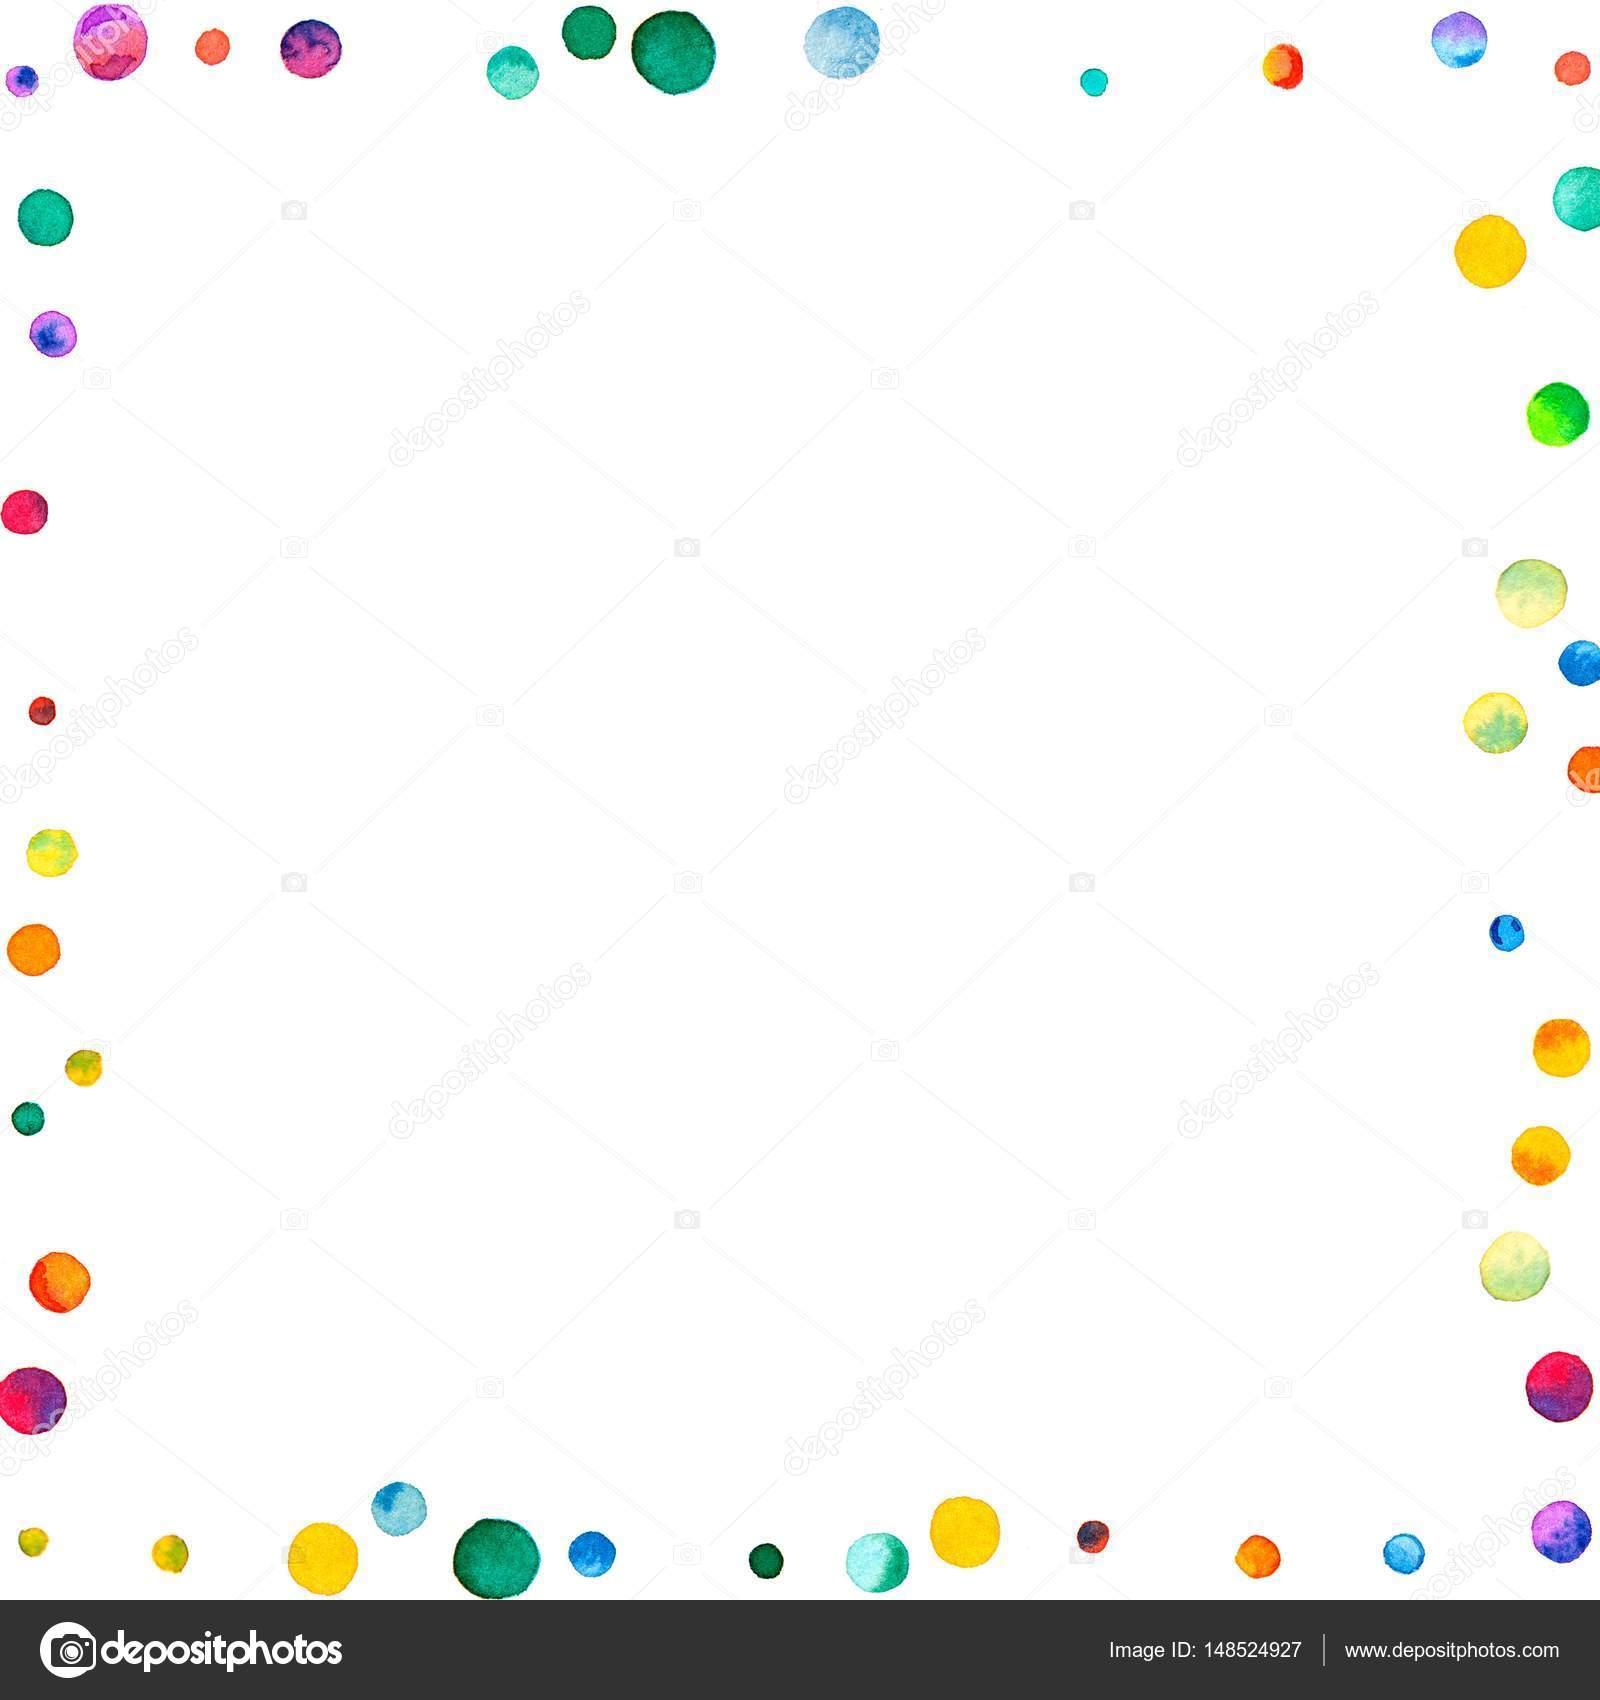 Confeti de acuarela escaso marco caótico de fondo blanco arco iris ...